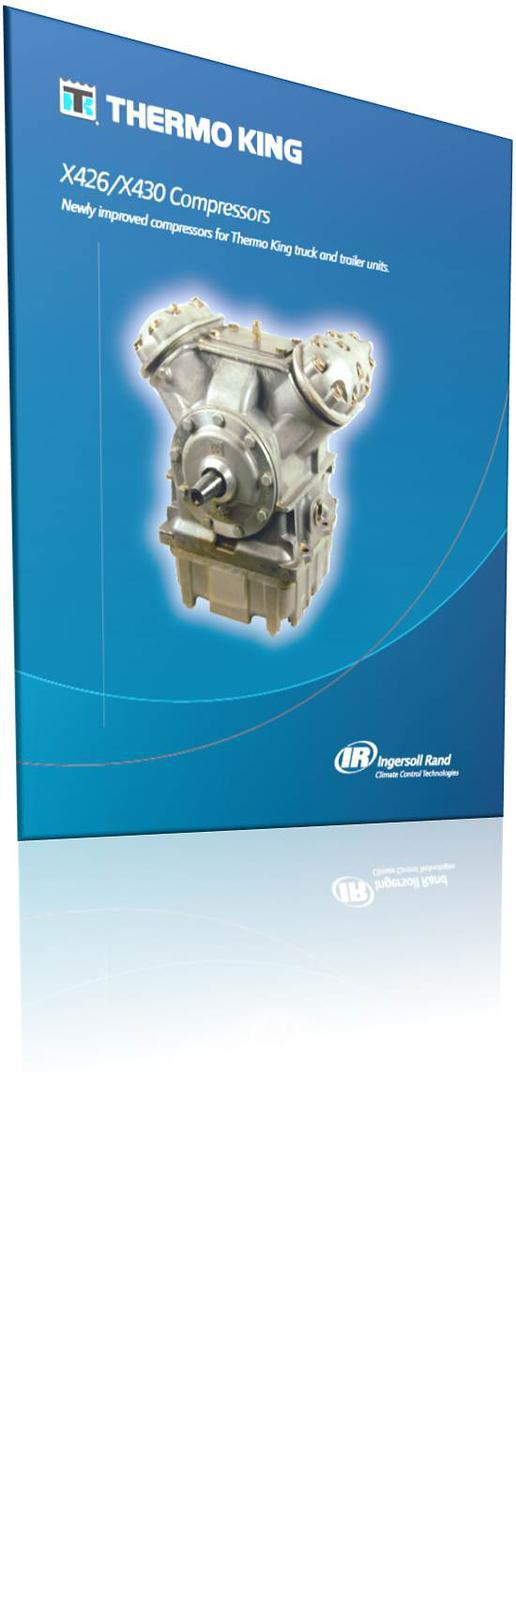 Genuine Thermo King Parts Northwest Kent Wa 800 678 2191 Alternators Diagram Alternator Belts Compressor